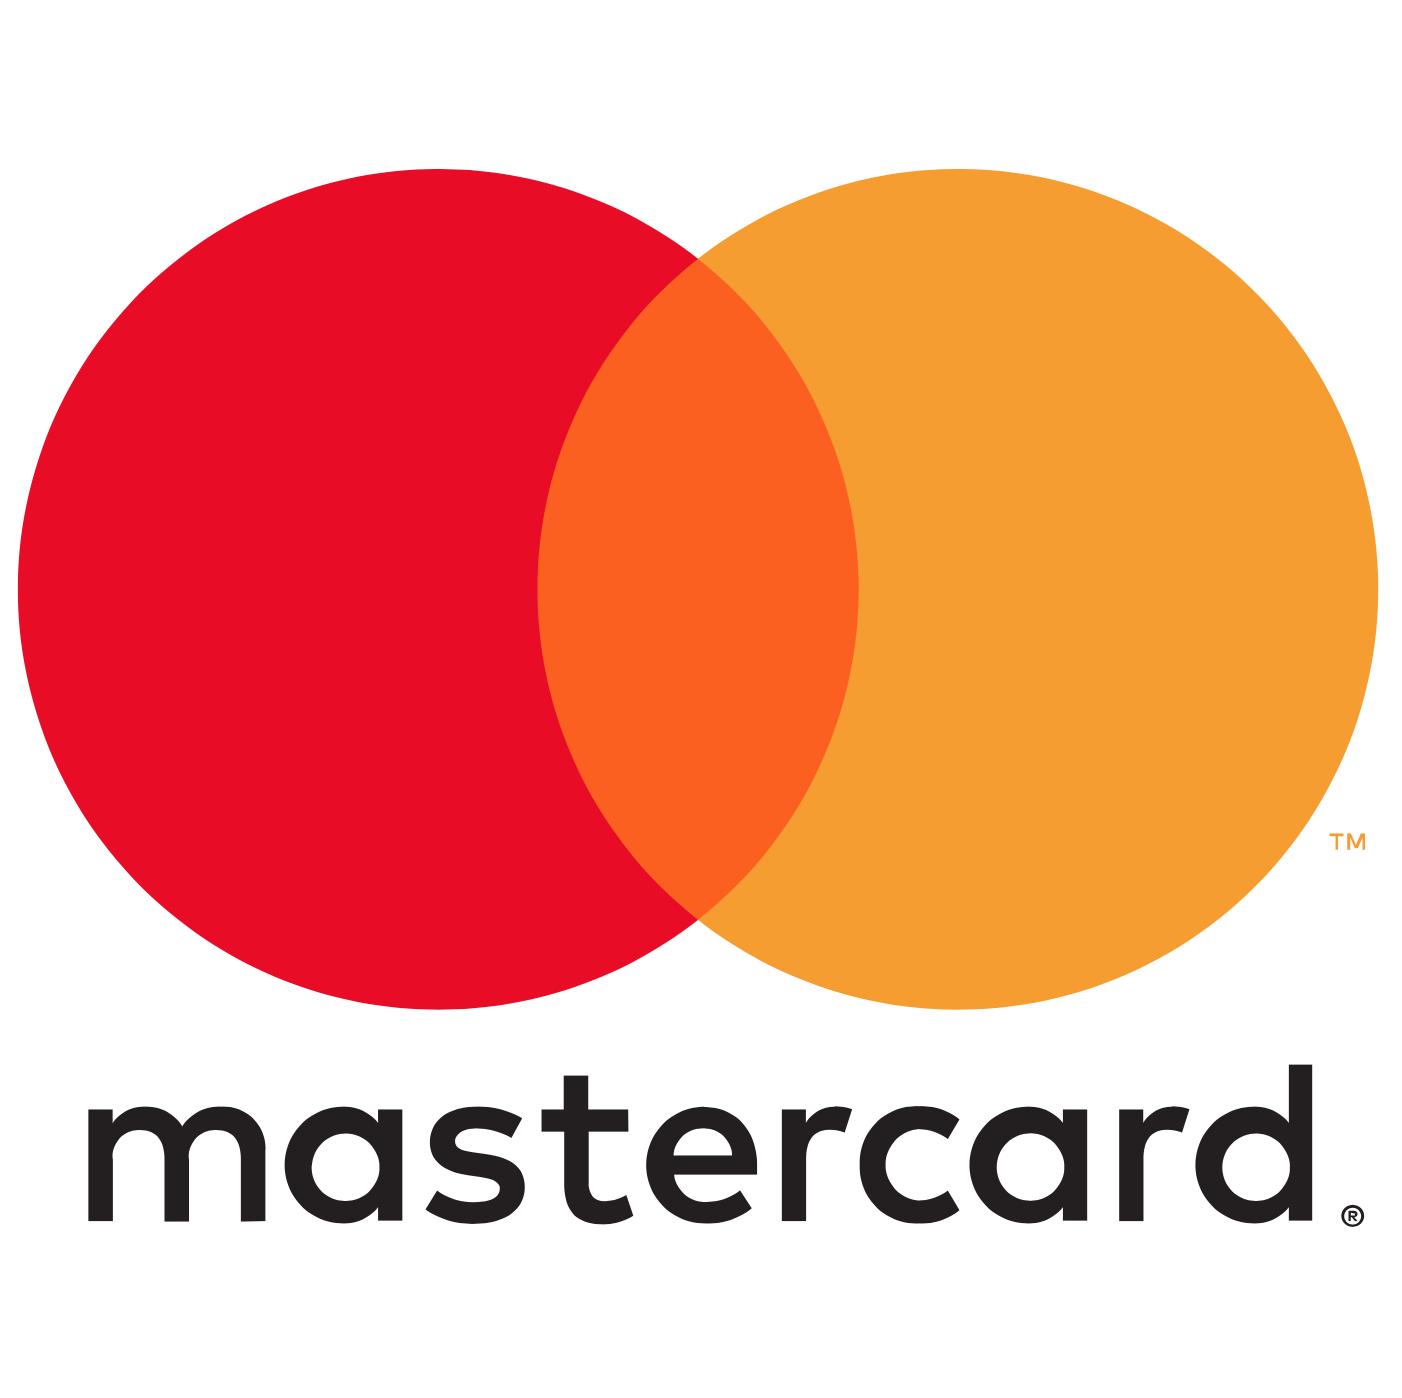 Mastercardom